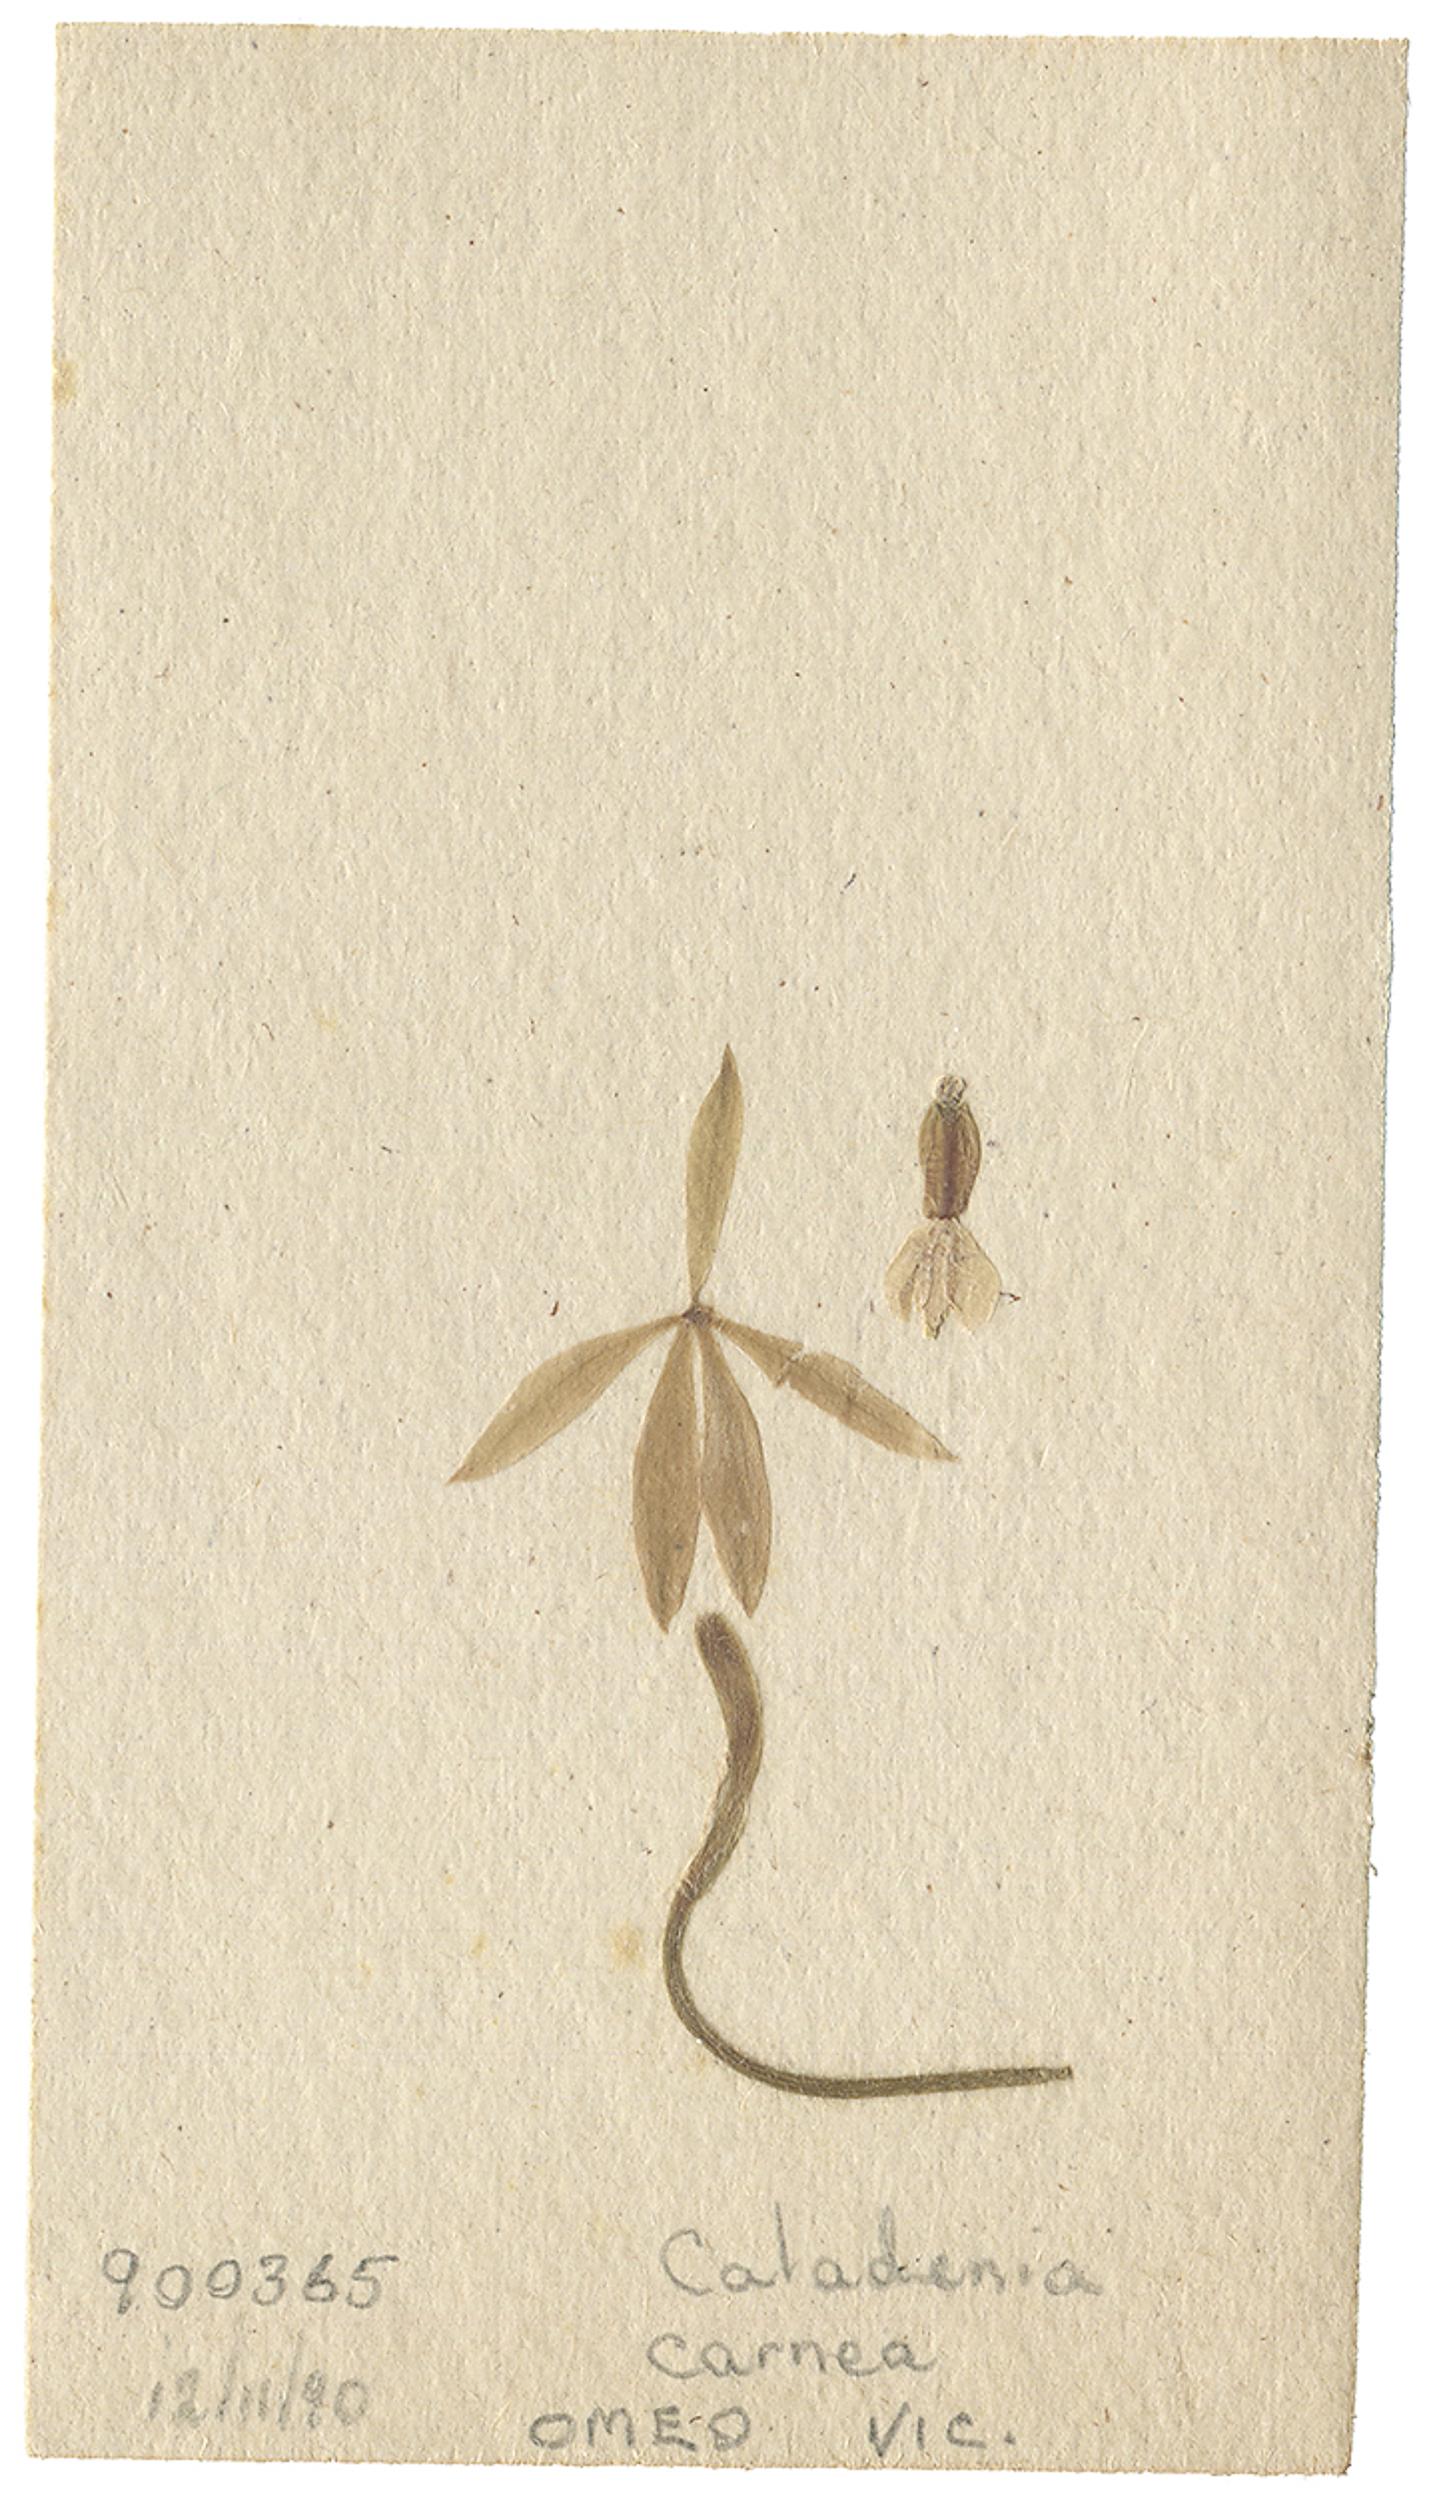 LYON 2017-06-24 Phils Orchid Specimens 200_E.jpg